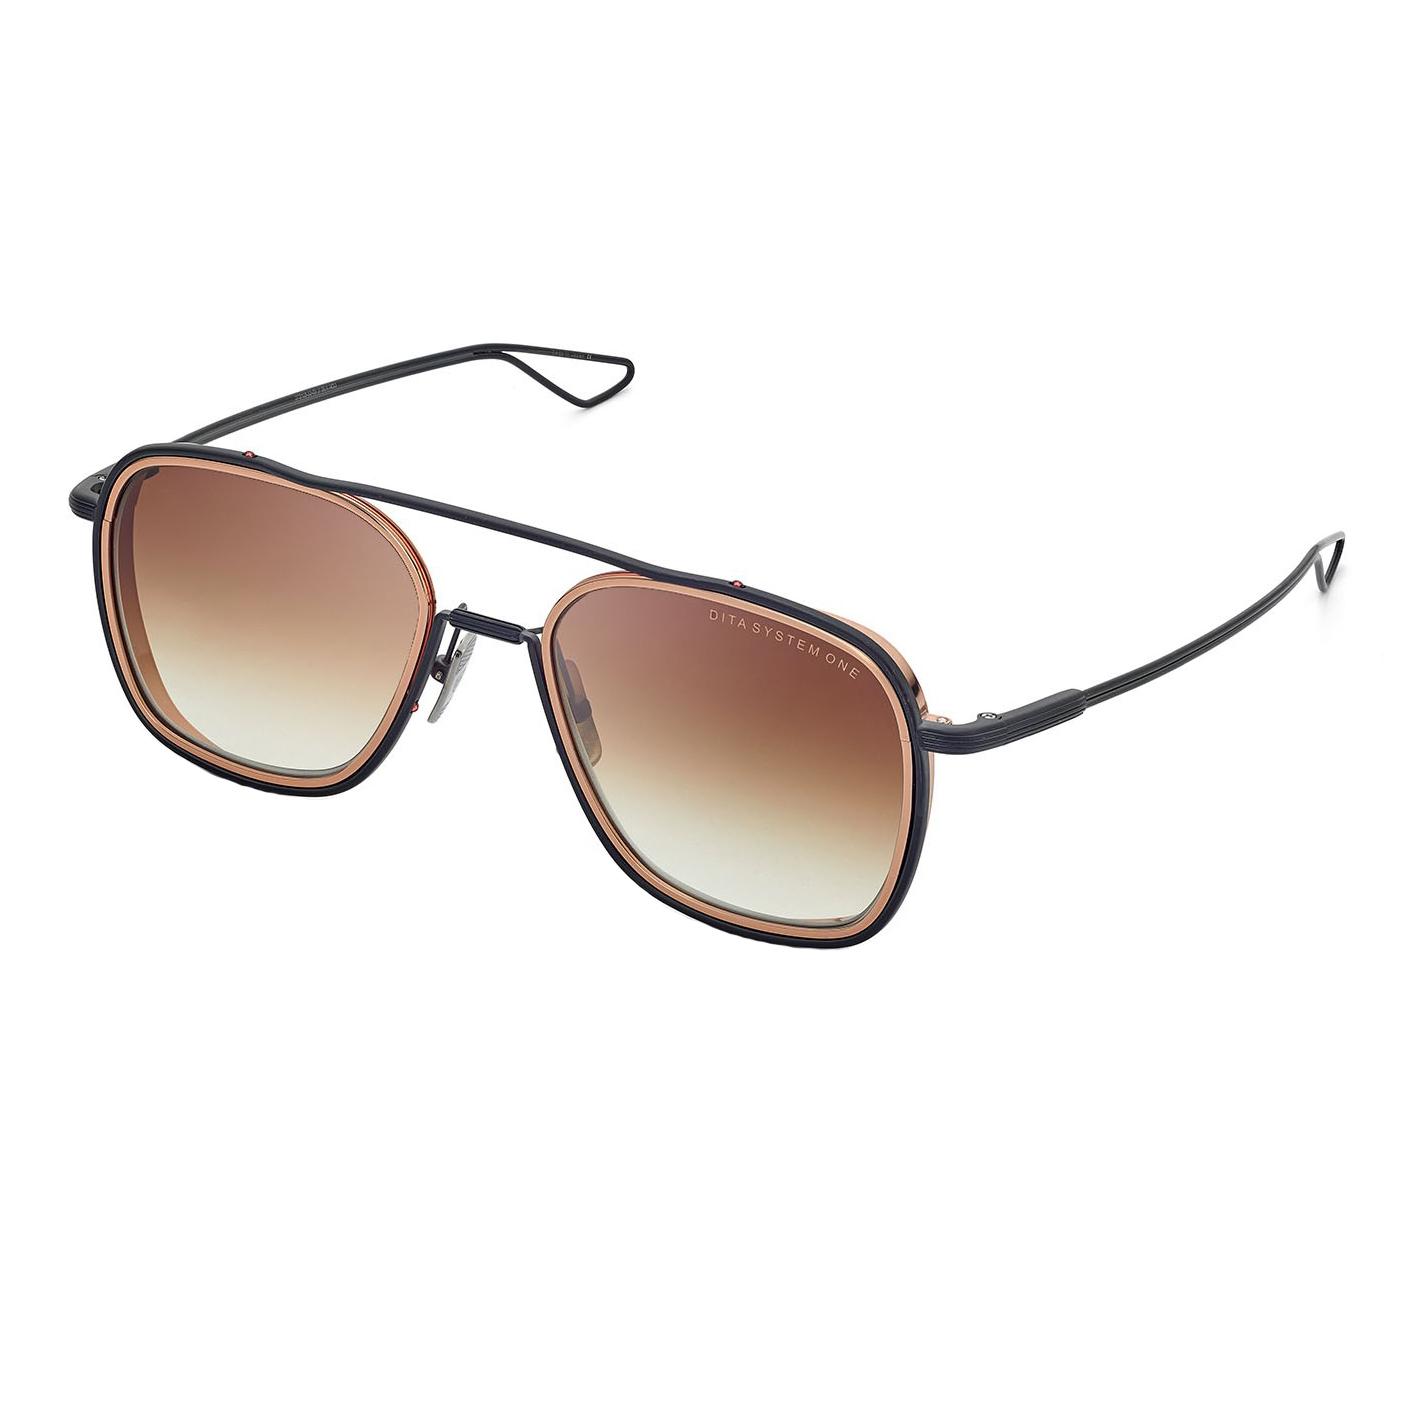 Ongekend Shop DITA System One zonnebrillen - optiek Lammerant Deinze RT-23